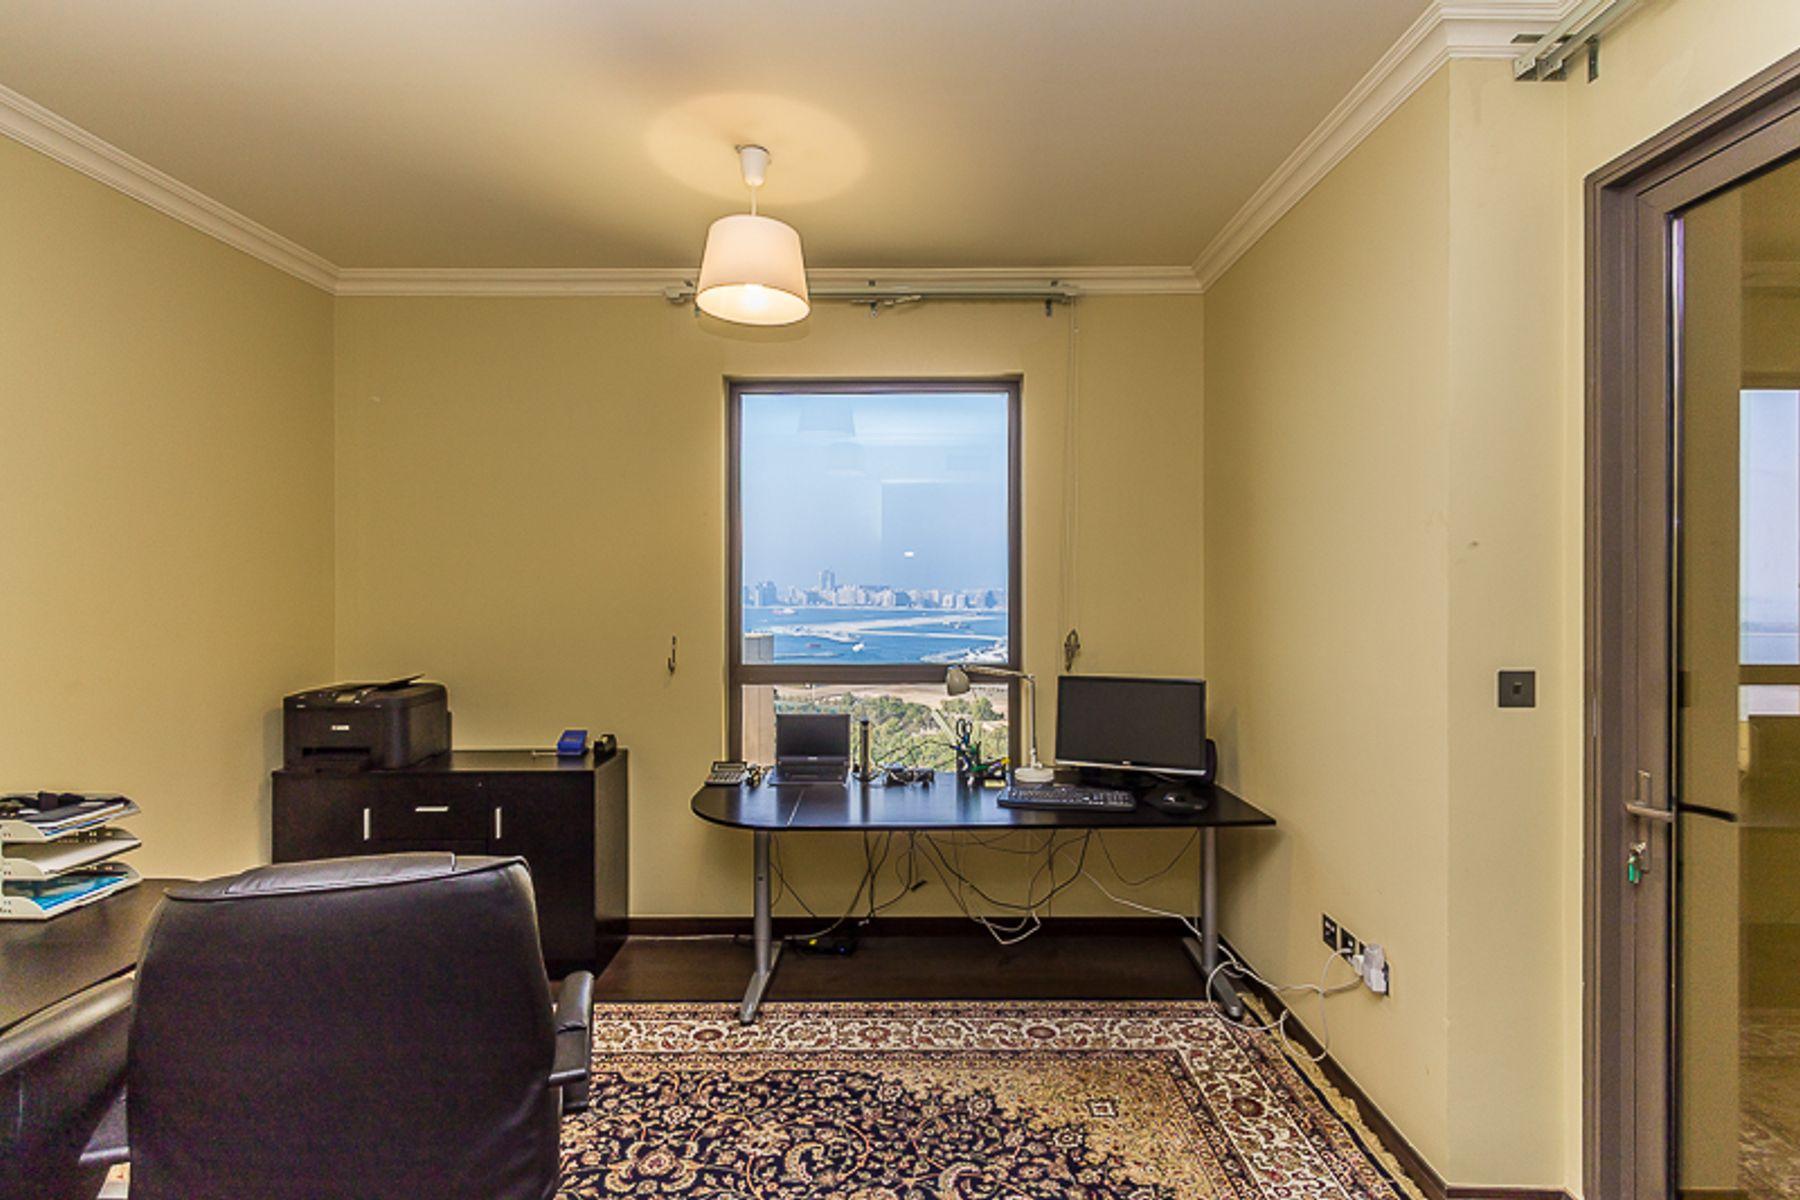 Apartment for Rent in Murjan 3 - Jumeirah Beach Residence